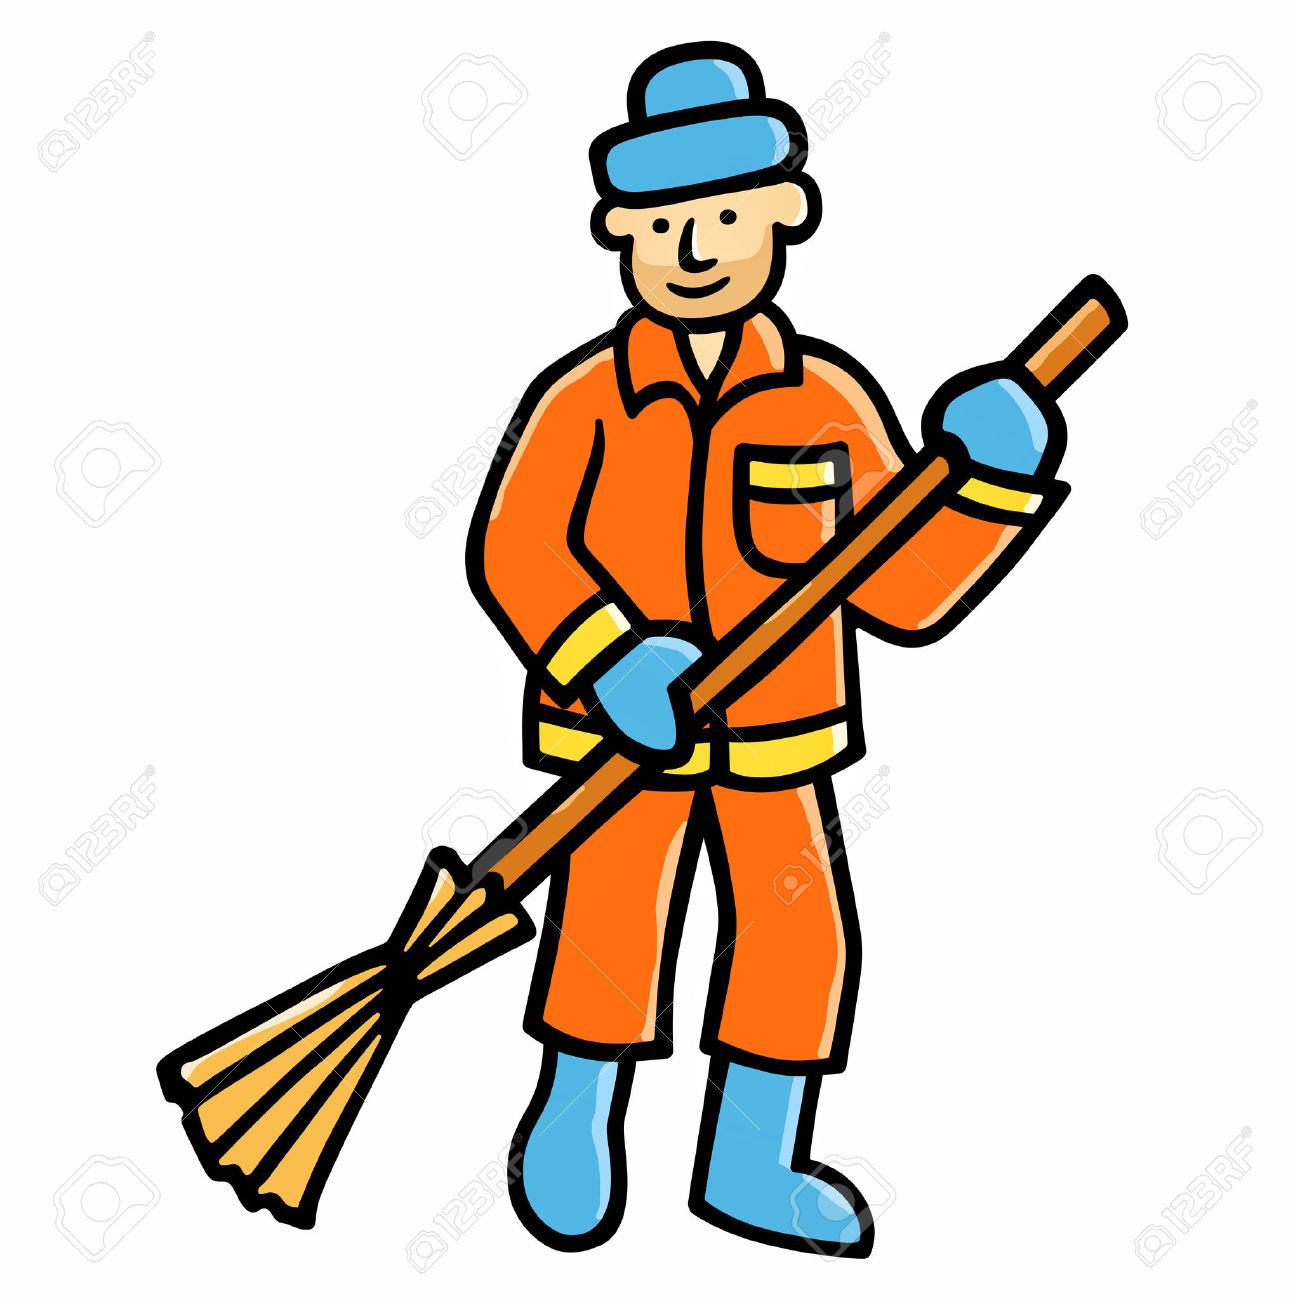 street-cleaner-sweeper